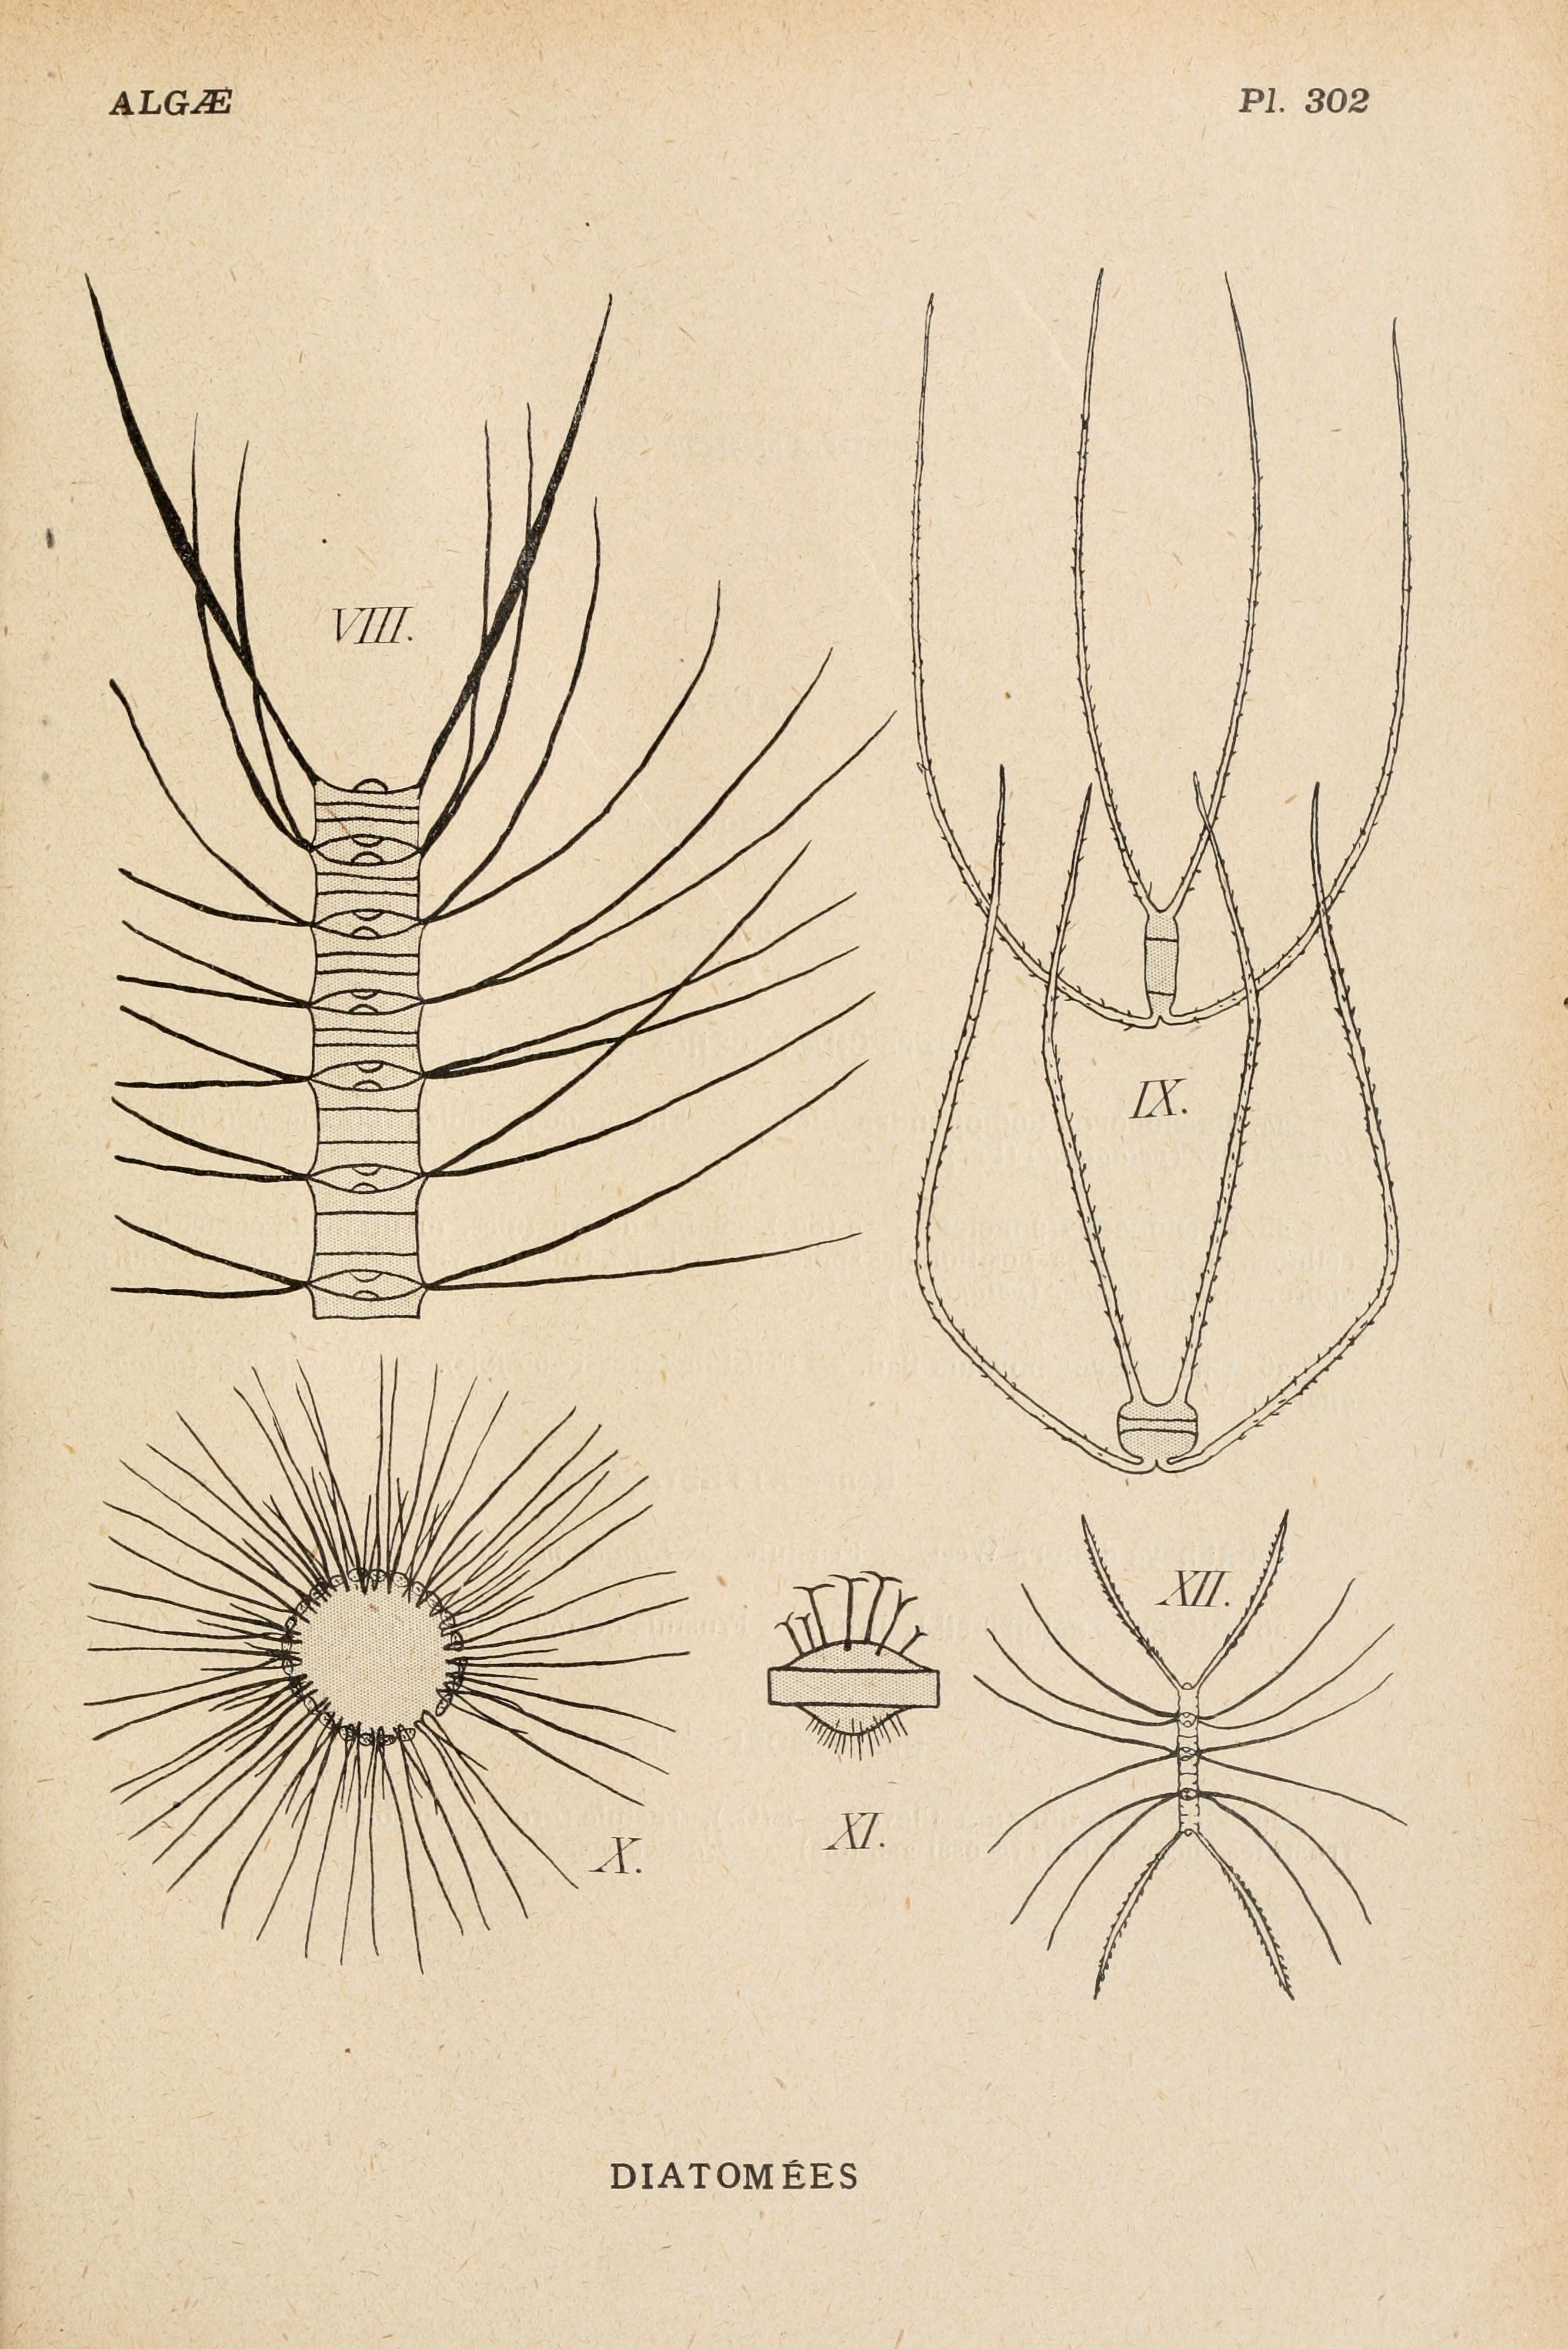 Image of Chaetoceros